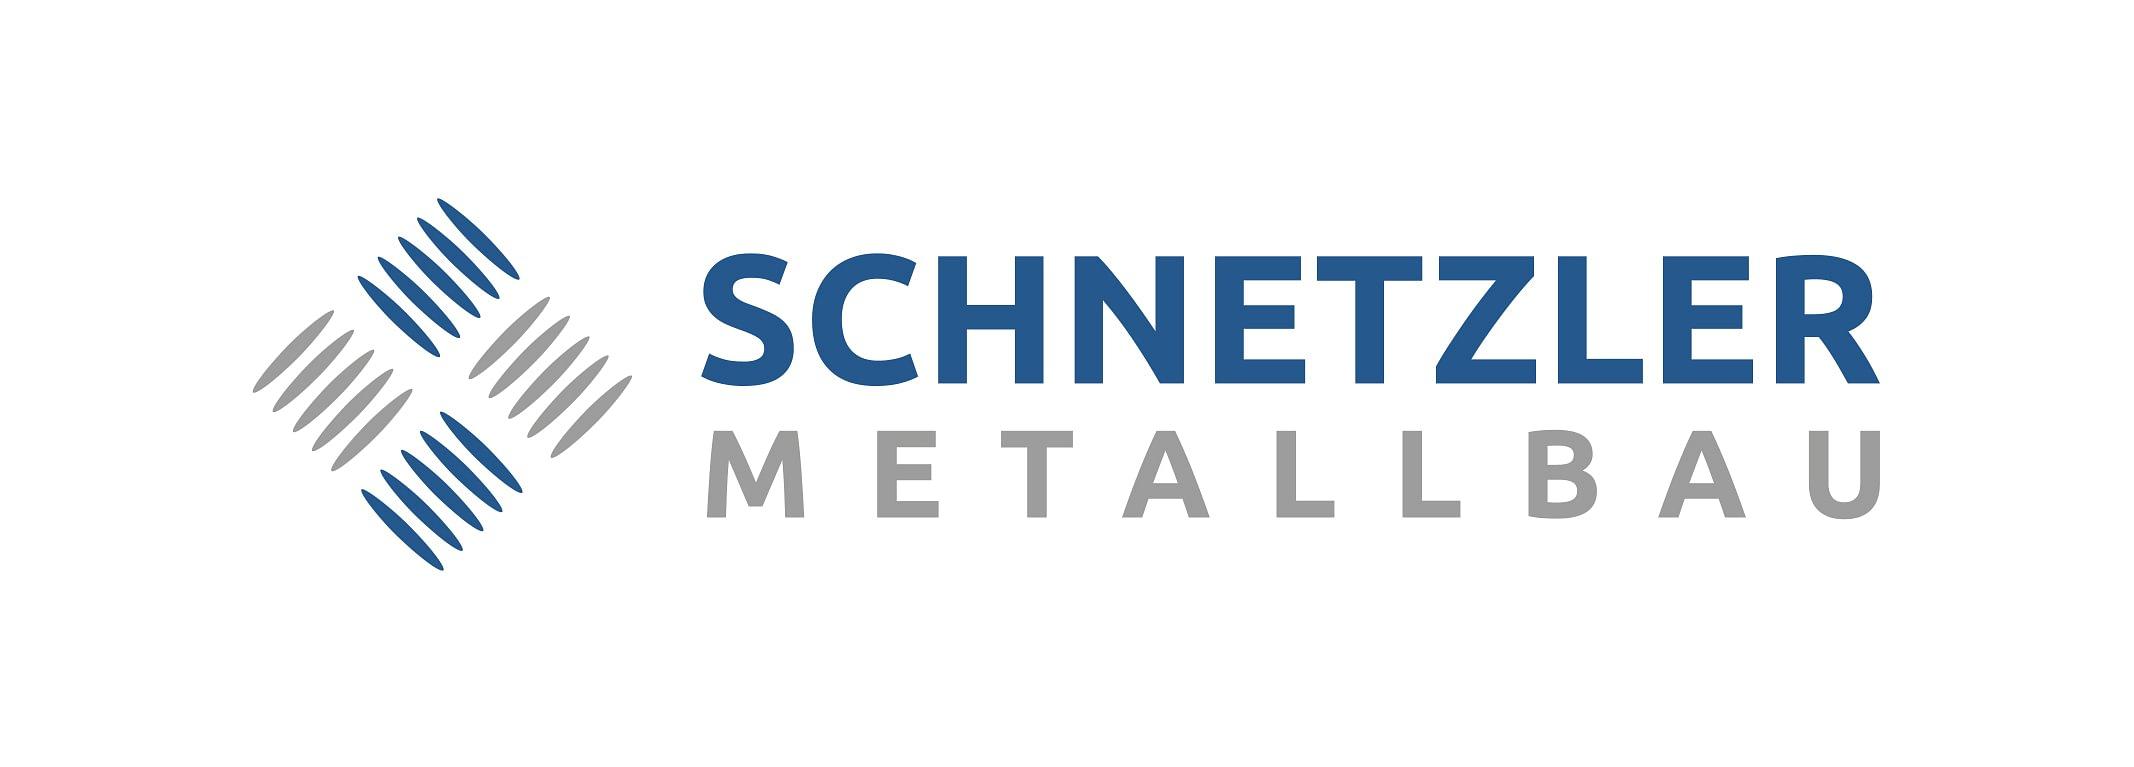 Schnetzler Metallbau AG